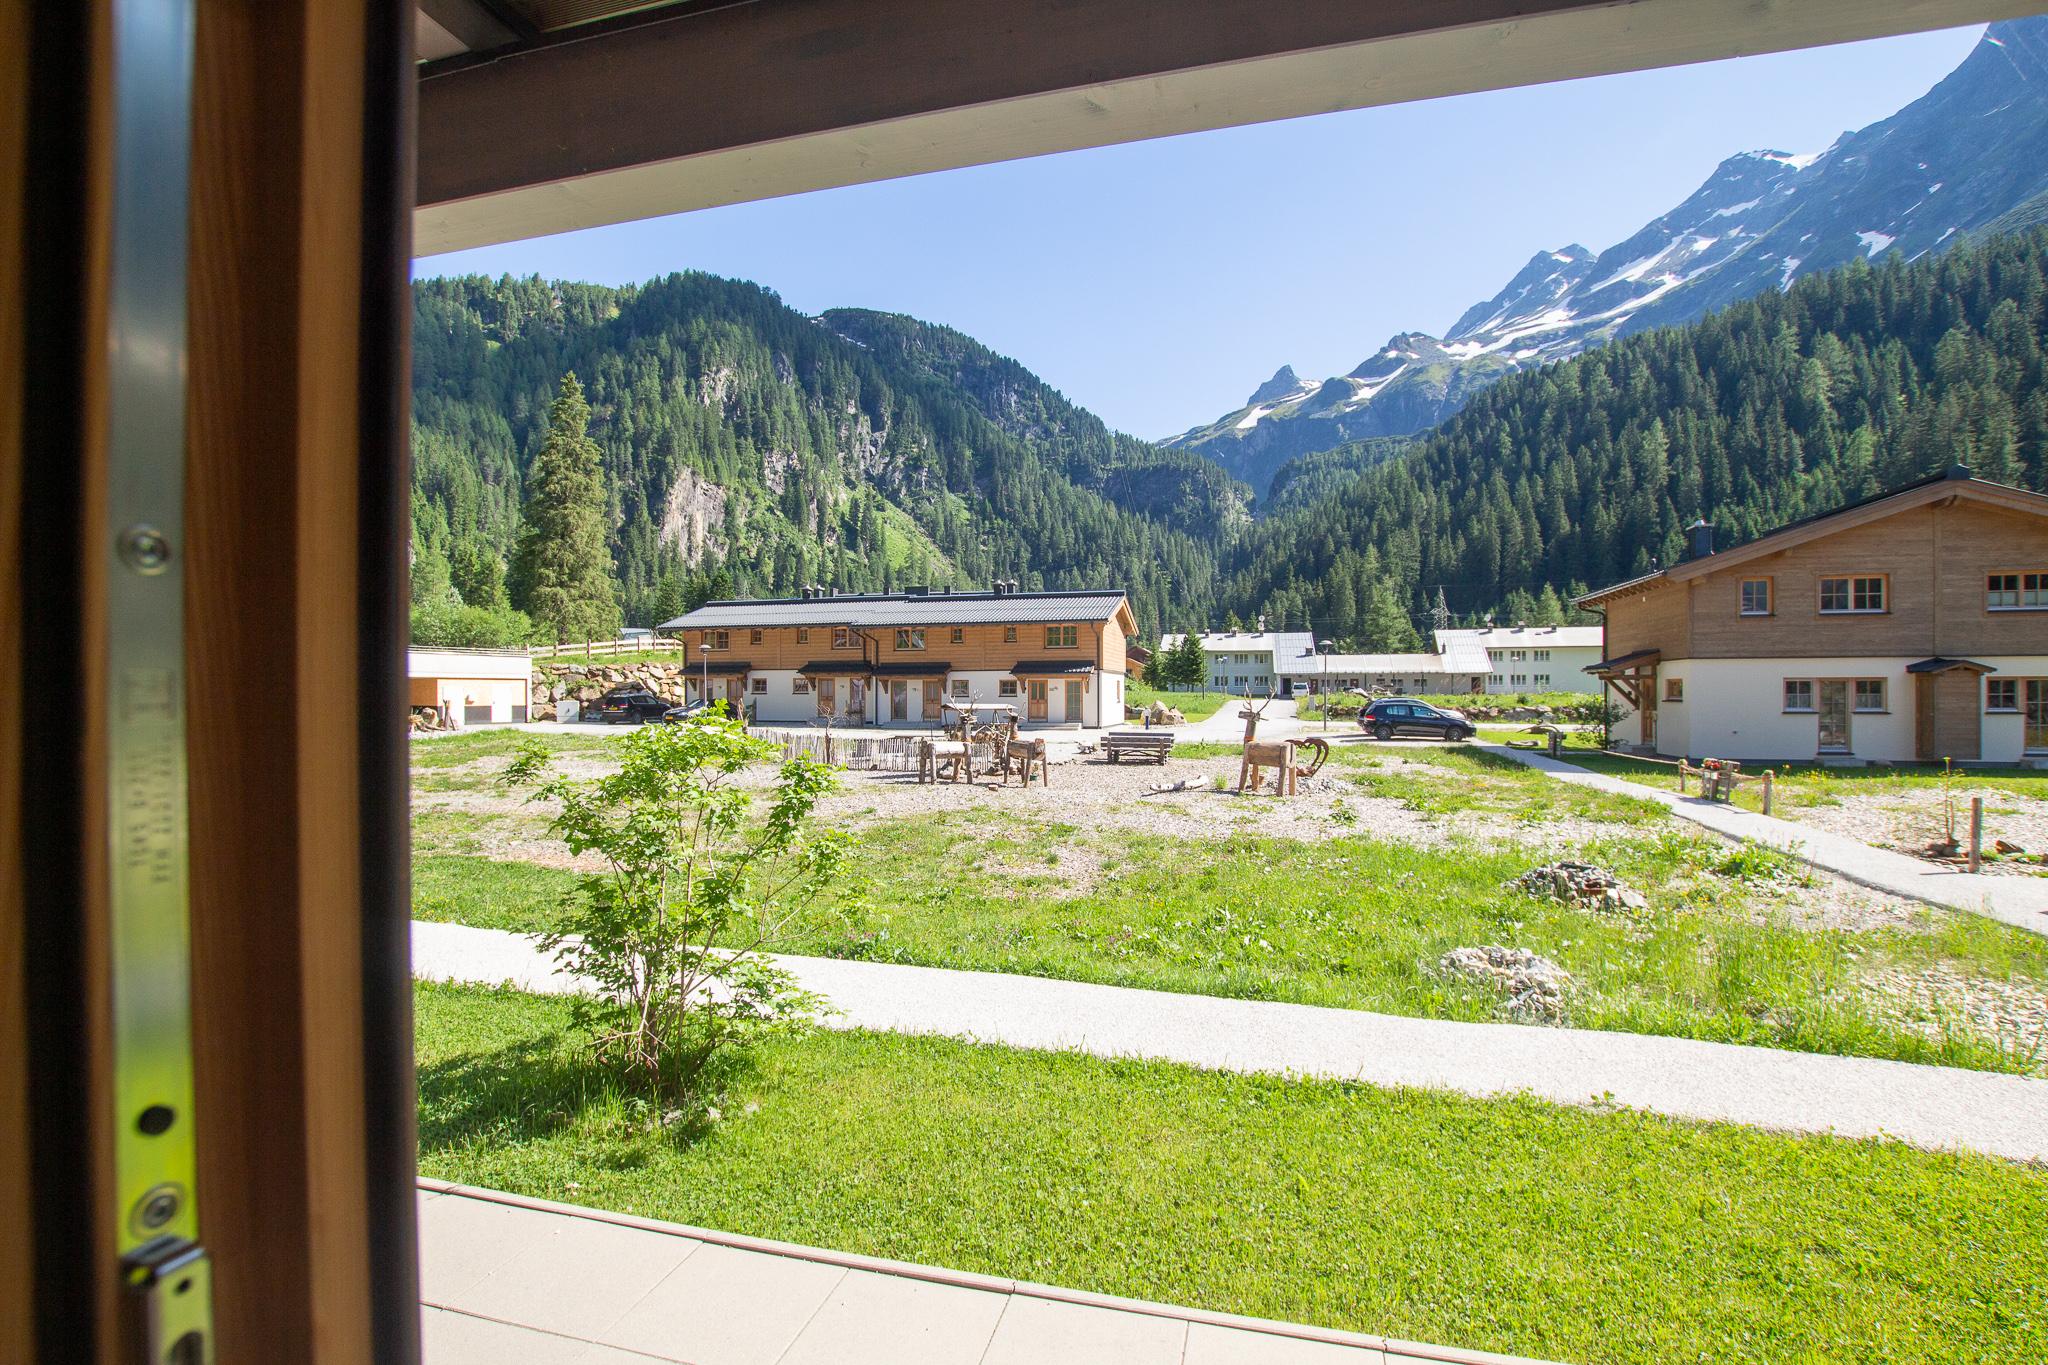 Maison de vacances Lodge Seeblick am Skilift und Bergsee für 5 (2636751), Uttendorf, Pinzgau, Salzbourg, Autriche, image 36